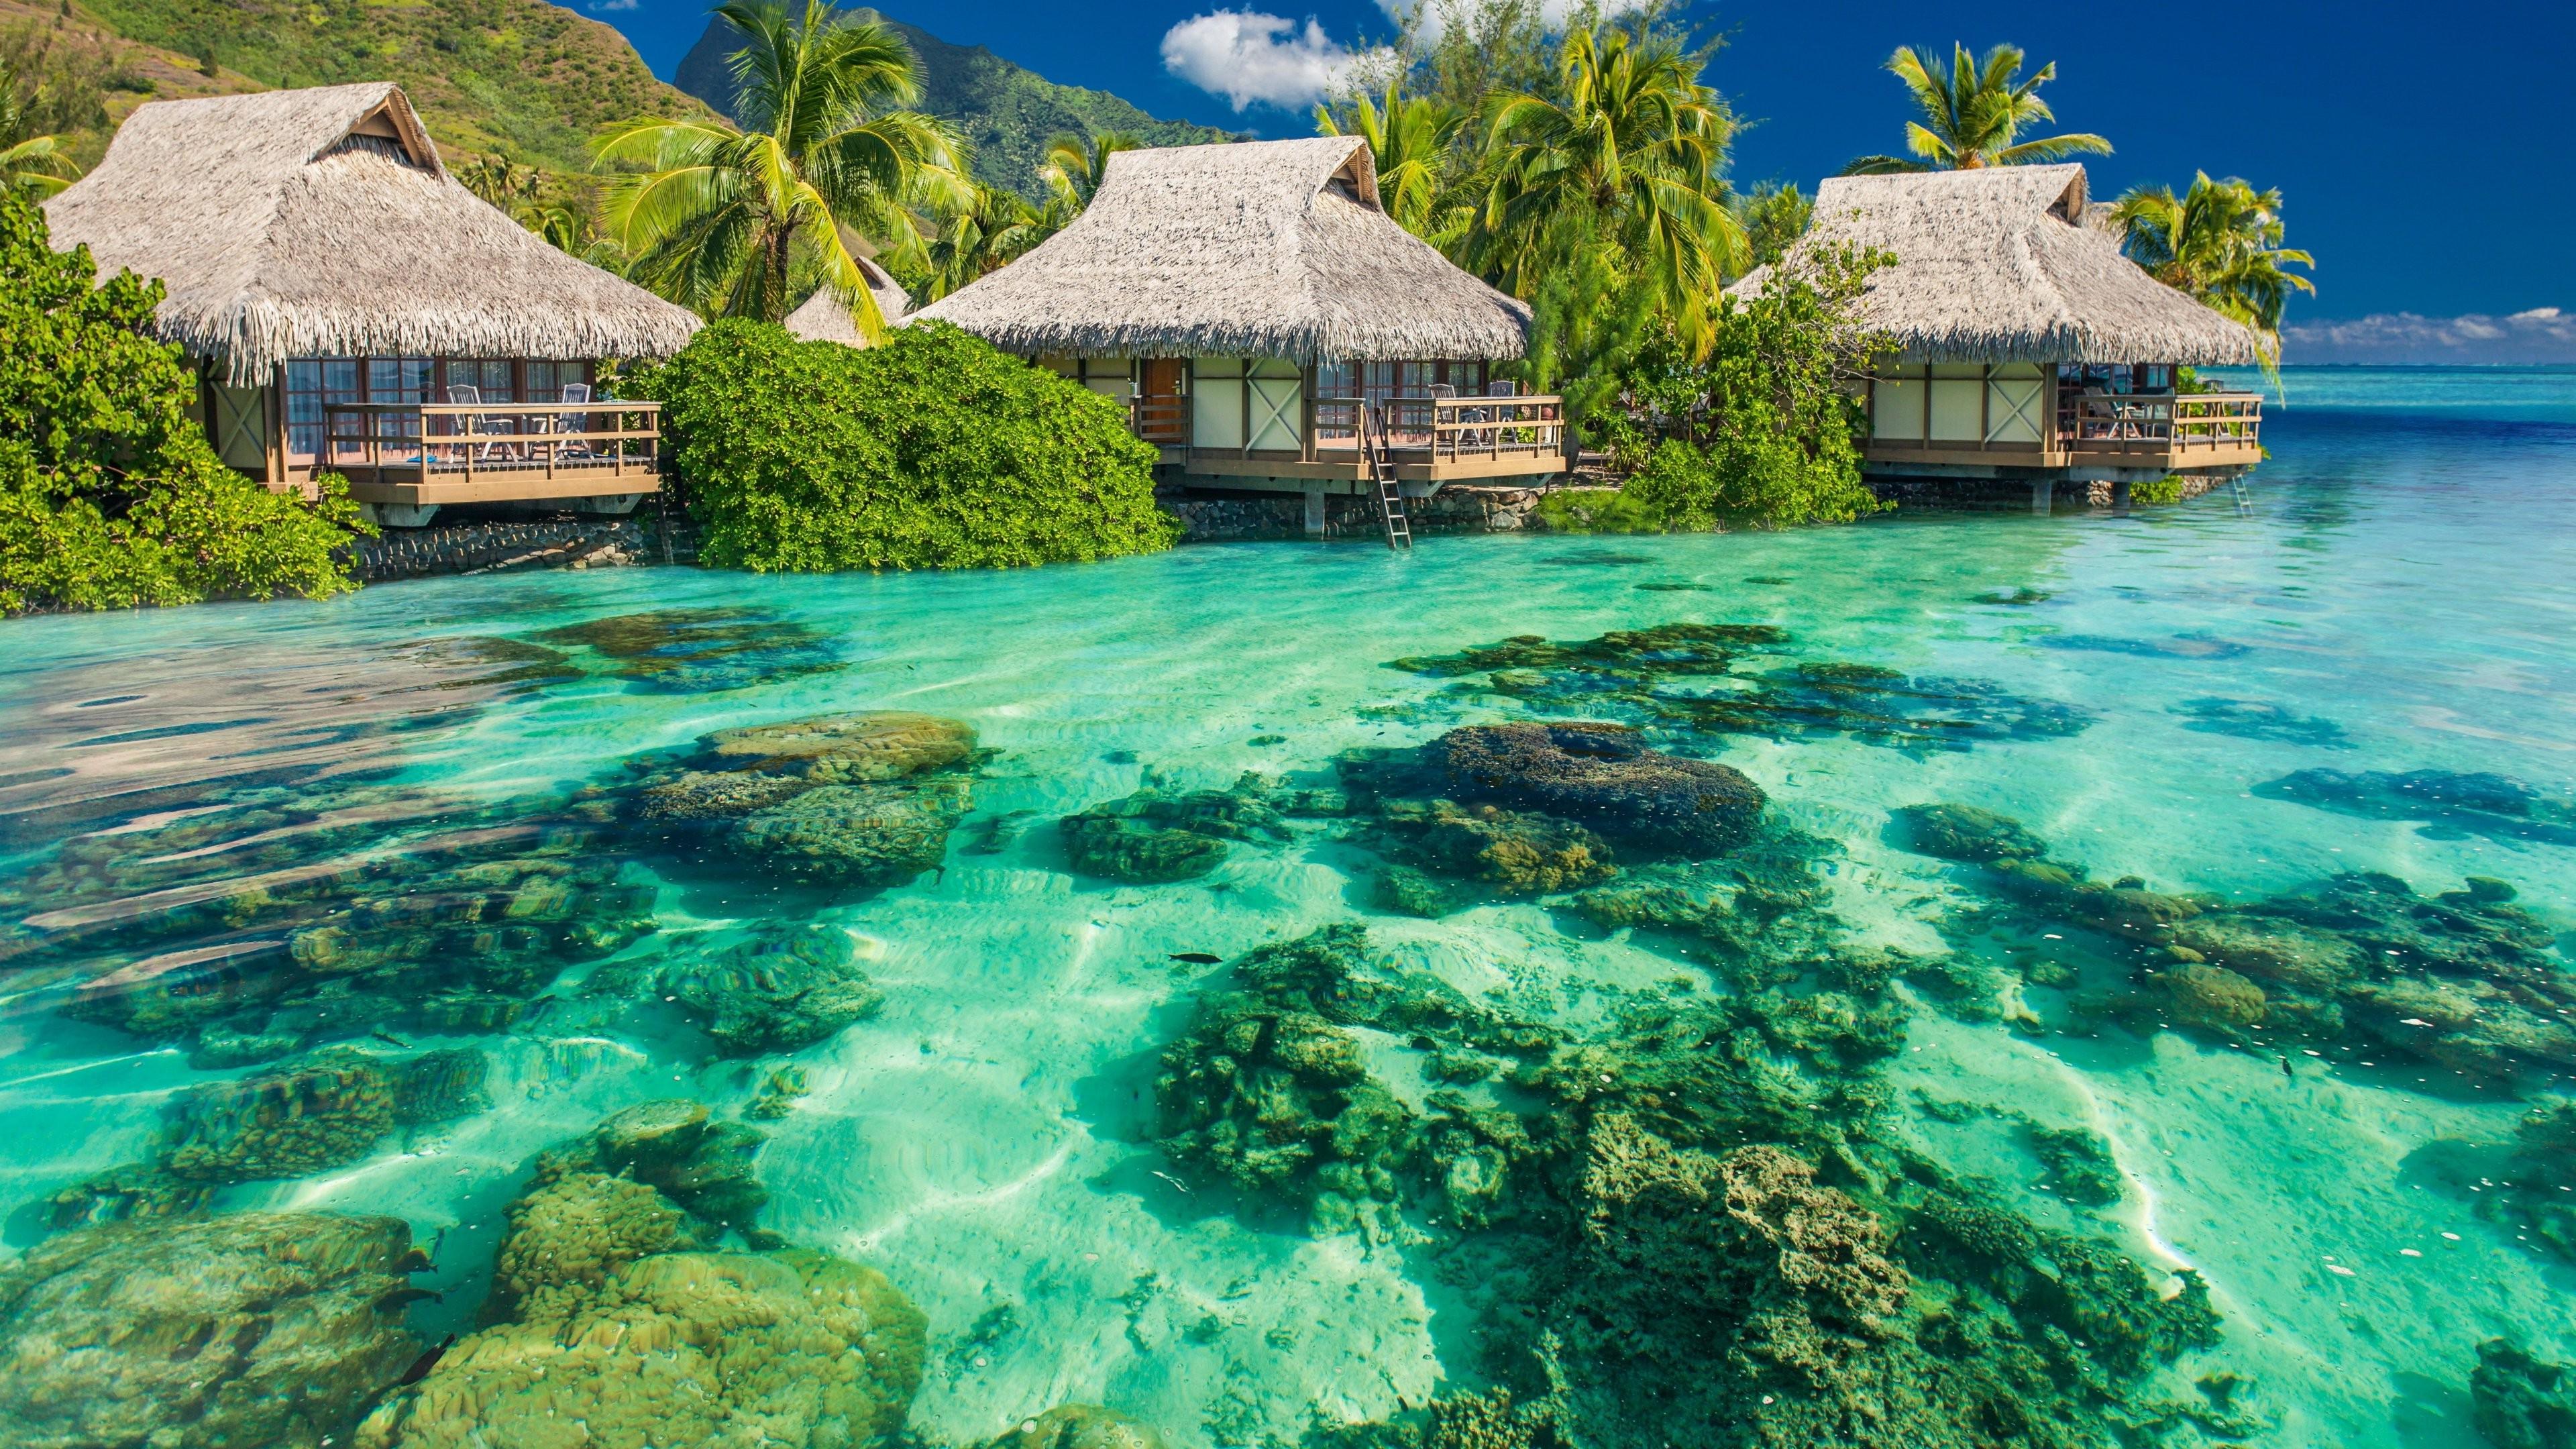 Free 3d Scenic Wallpaper Beach Island Nature Landscape Wallpapers Hd Desktop